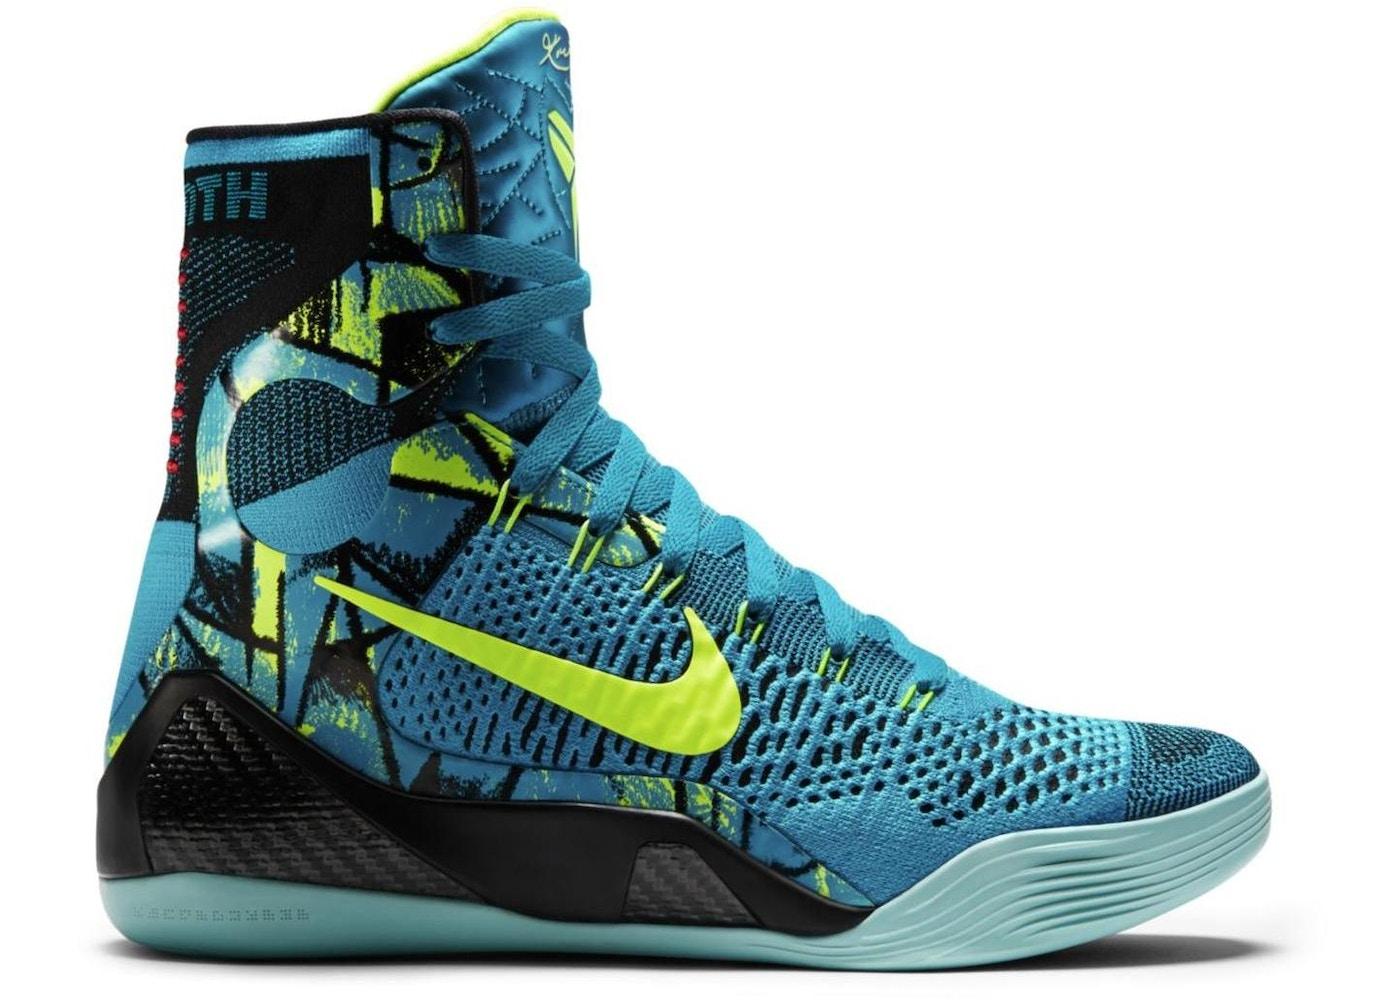 new style 7c7cf d2ce1 Buy Nike Kobe 9 Shoes   Deadstock Sneakers